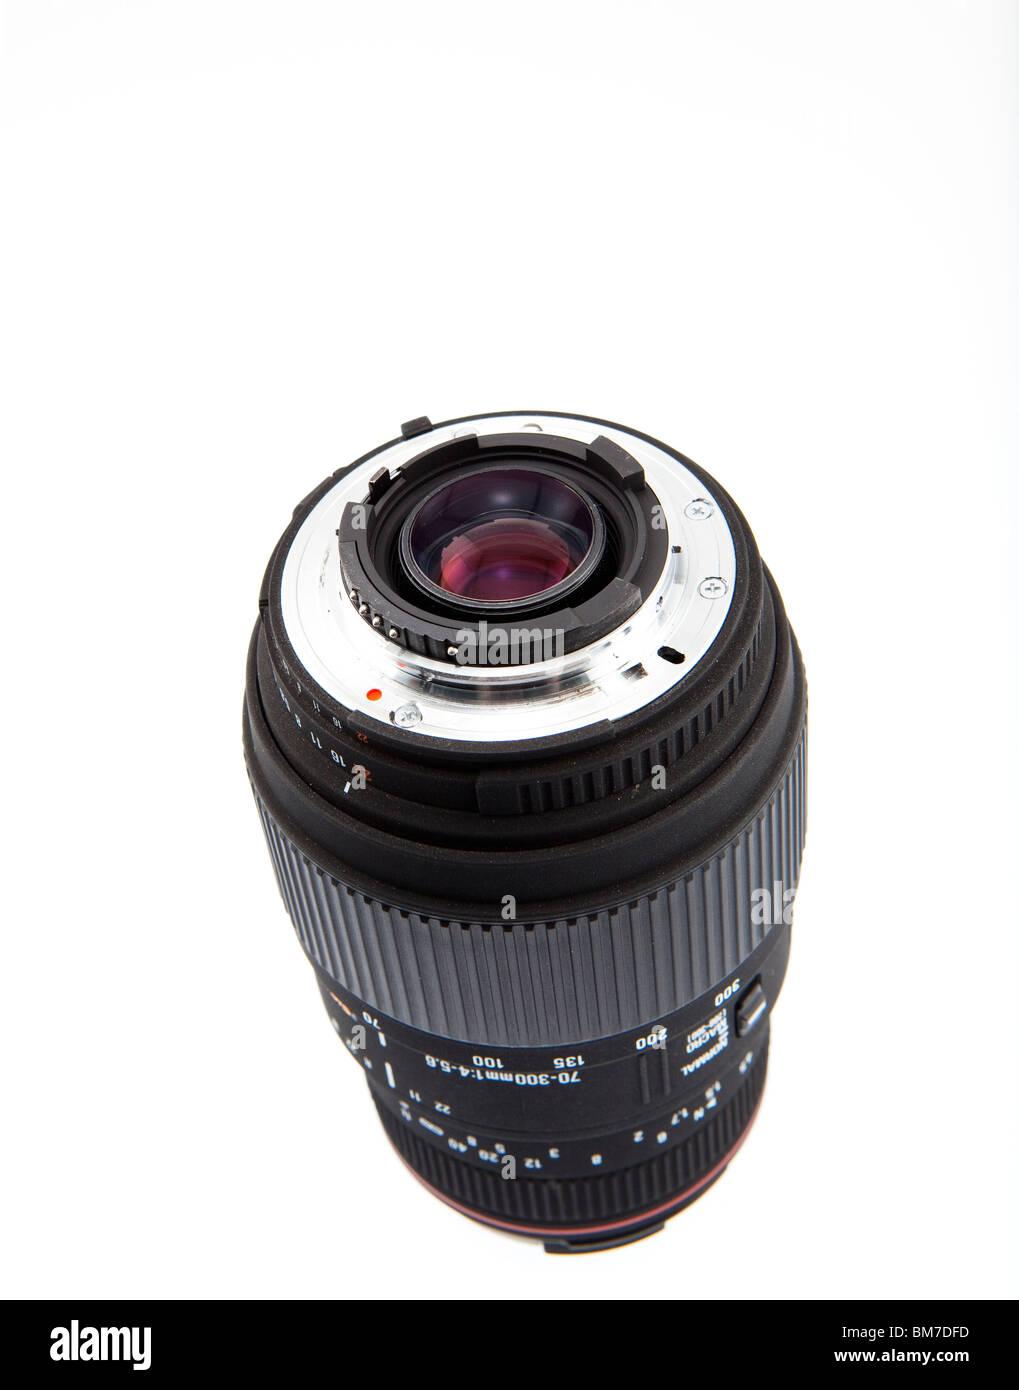 Sigma NIkon mount budget zoom lens - Stock Image